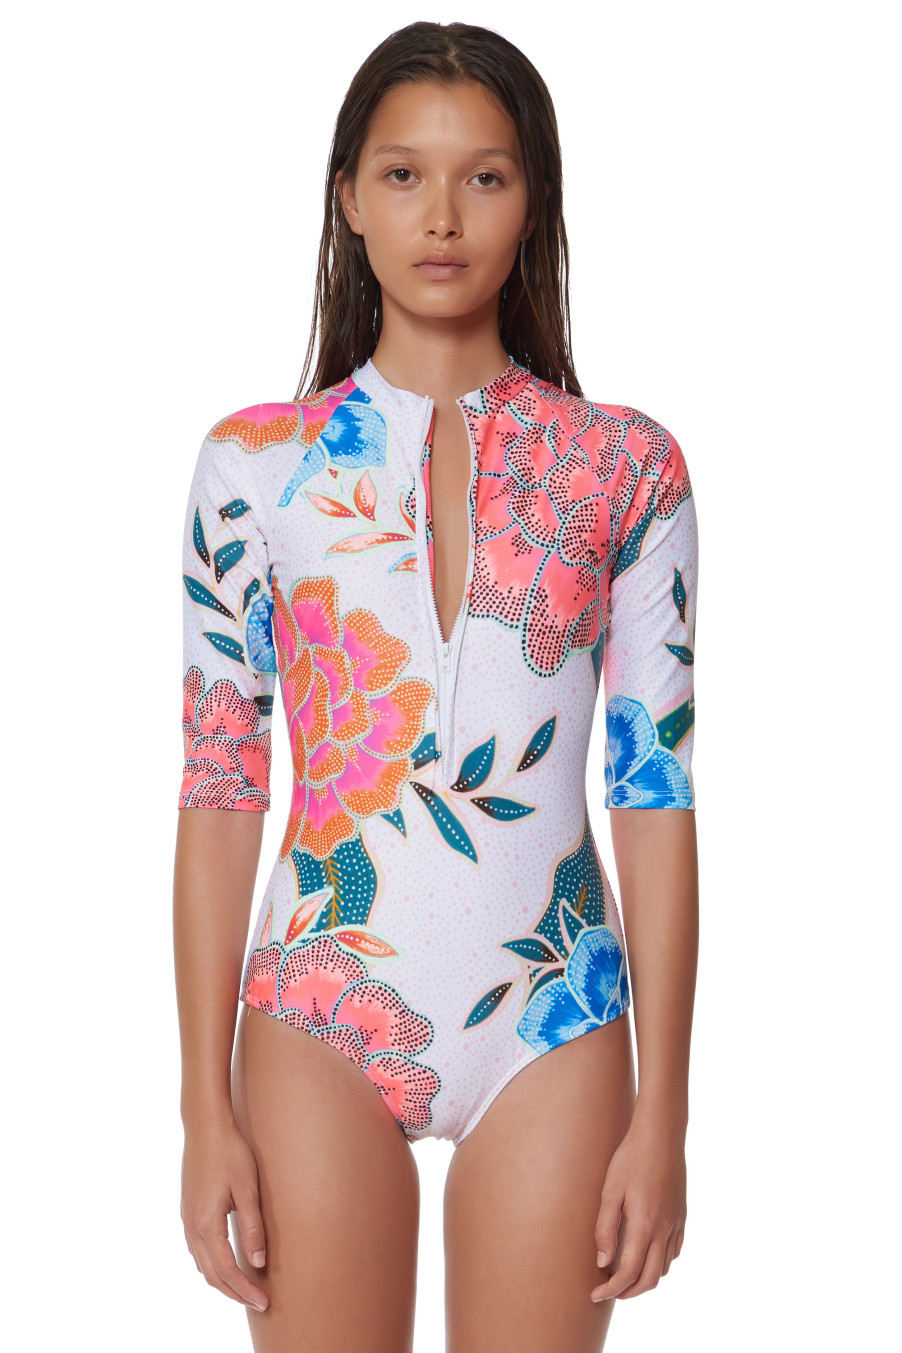 destiland-sexidesti-destination-wedding-bride-swimsuit-women-owned-swimwear-mara-hoffman-4.jpg